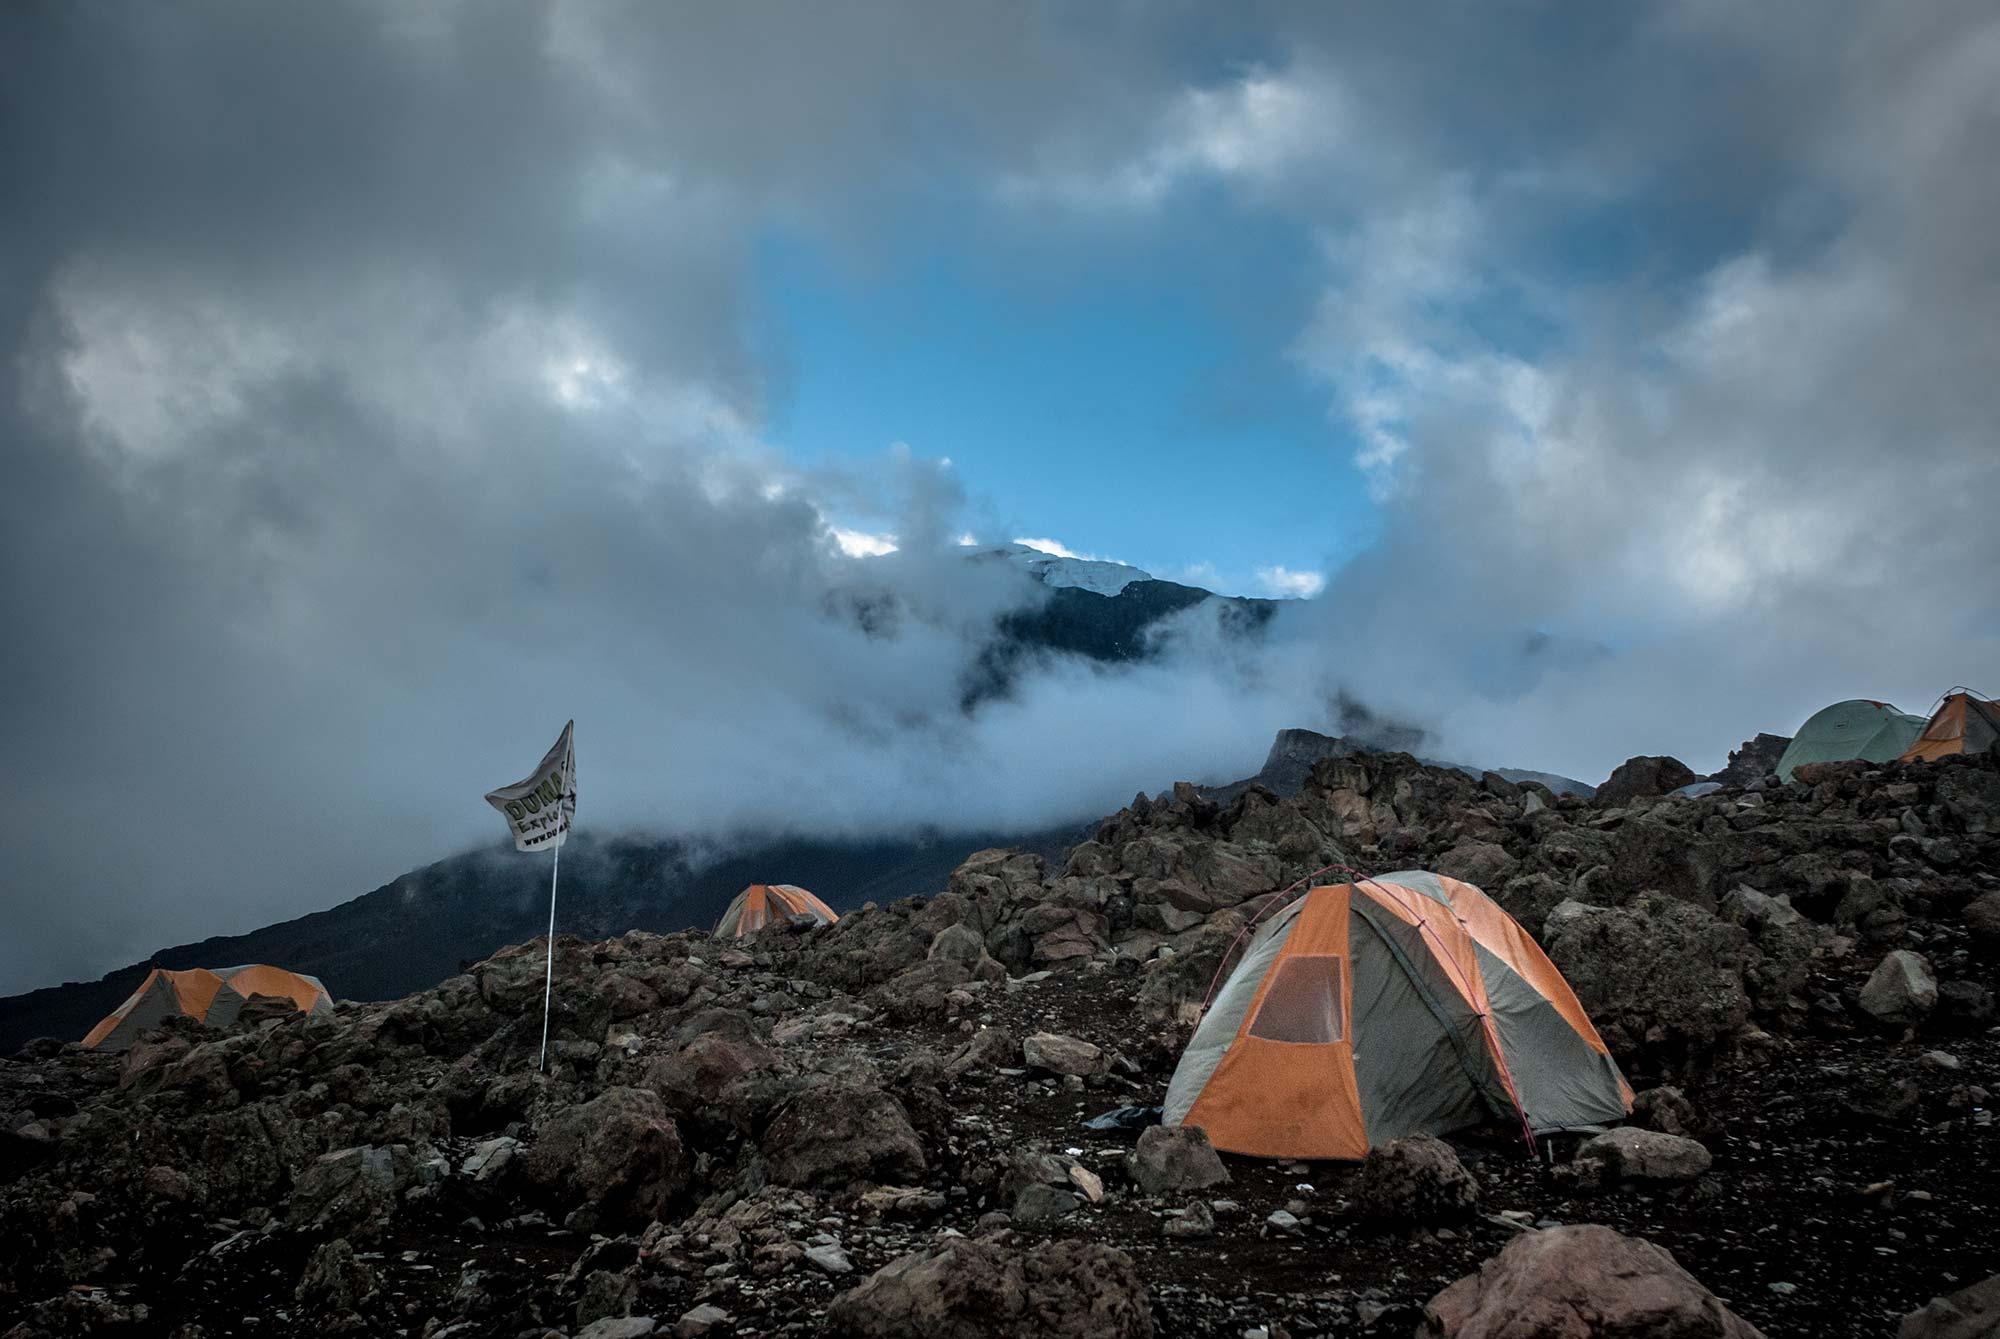 Duma Explorer flag whipping in the winds as the Sun sets over Barufu Camp, Kilimanjaro.